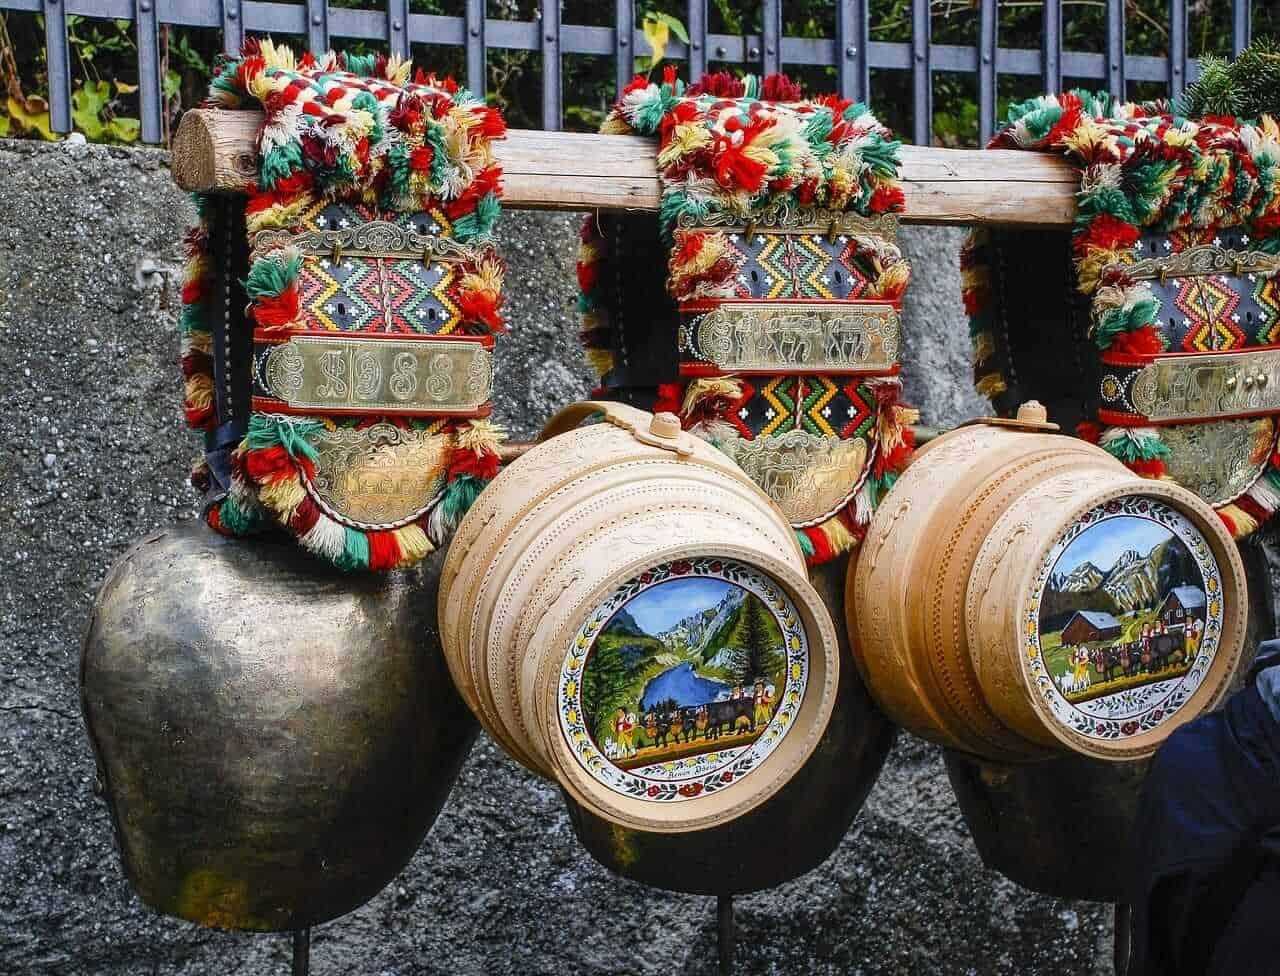 Switzerland trditional souvenirs